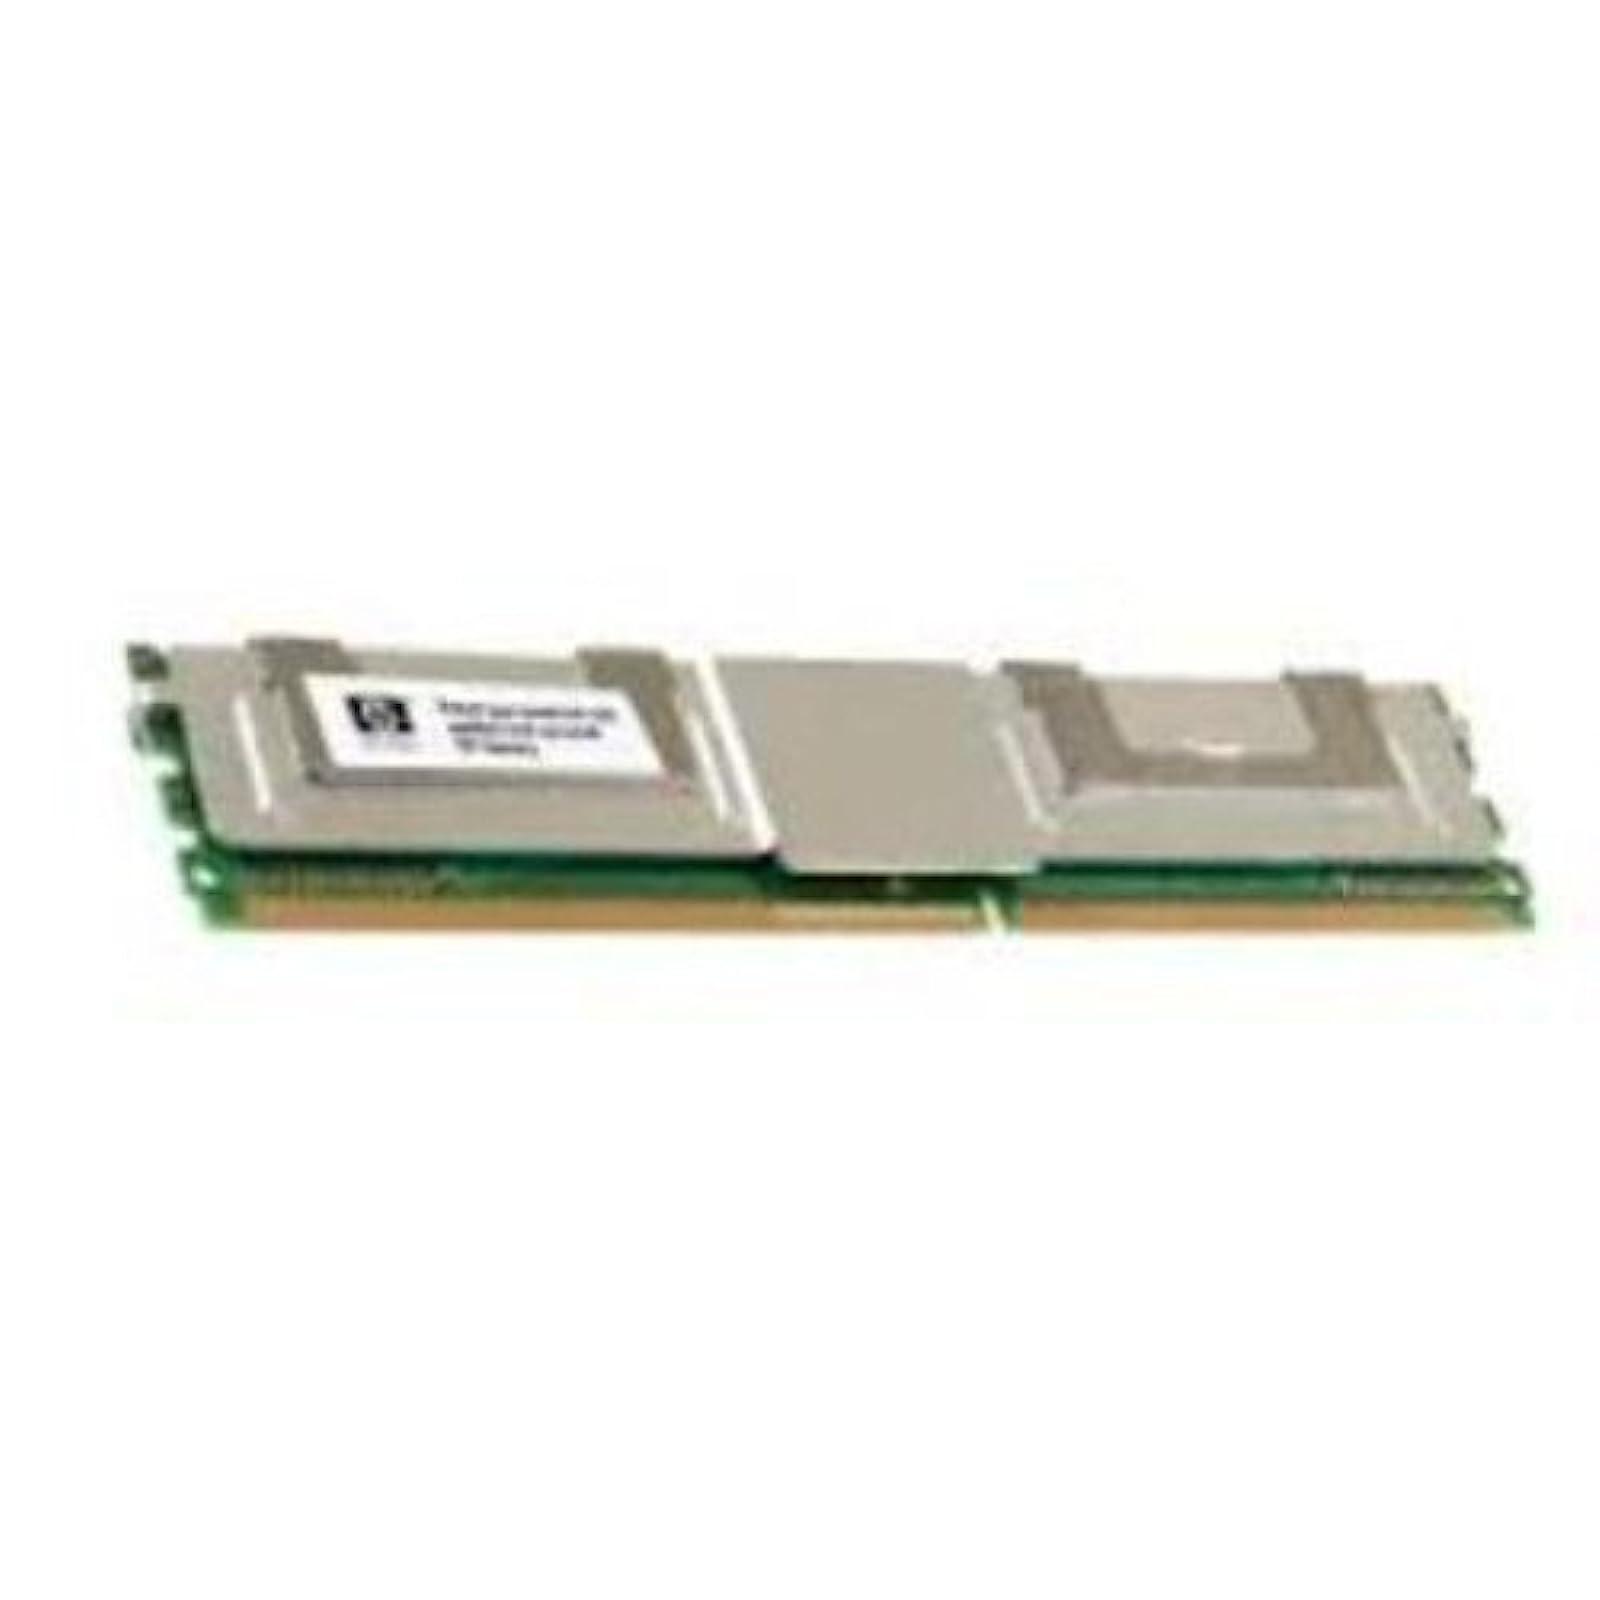 512MB DDR2 PC2-5300 667MHZ 240PIN Ecc Fb-Dimm CL5 HP 398705051